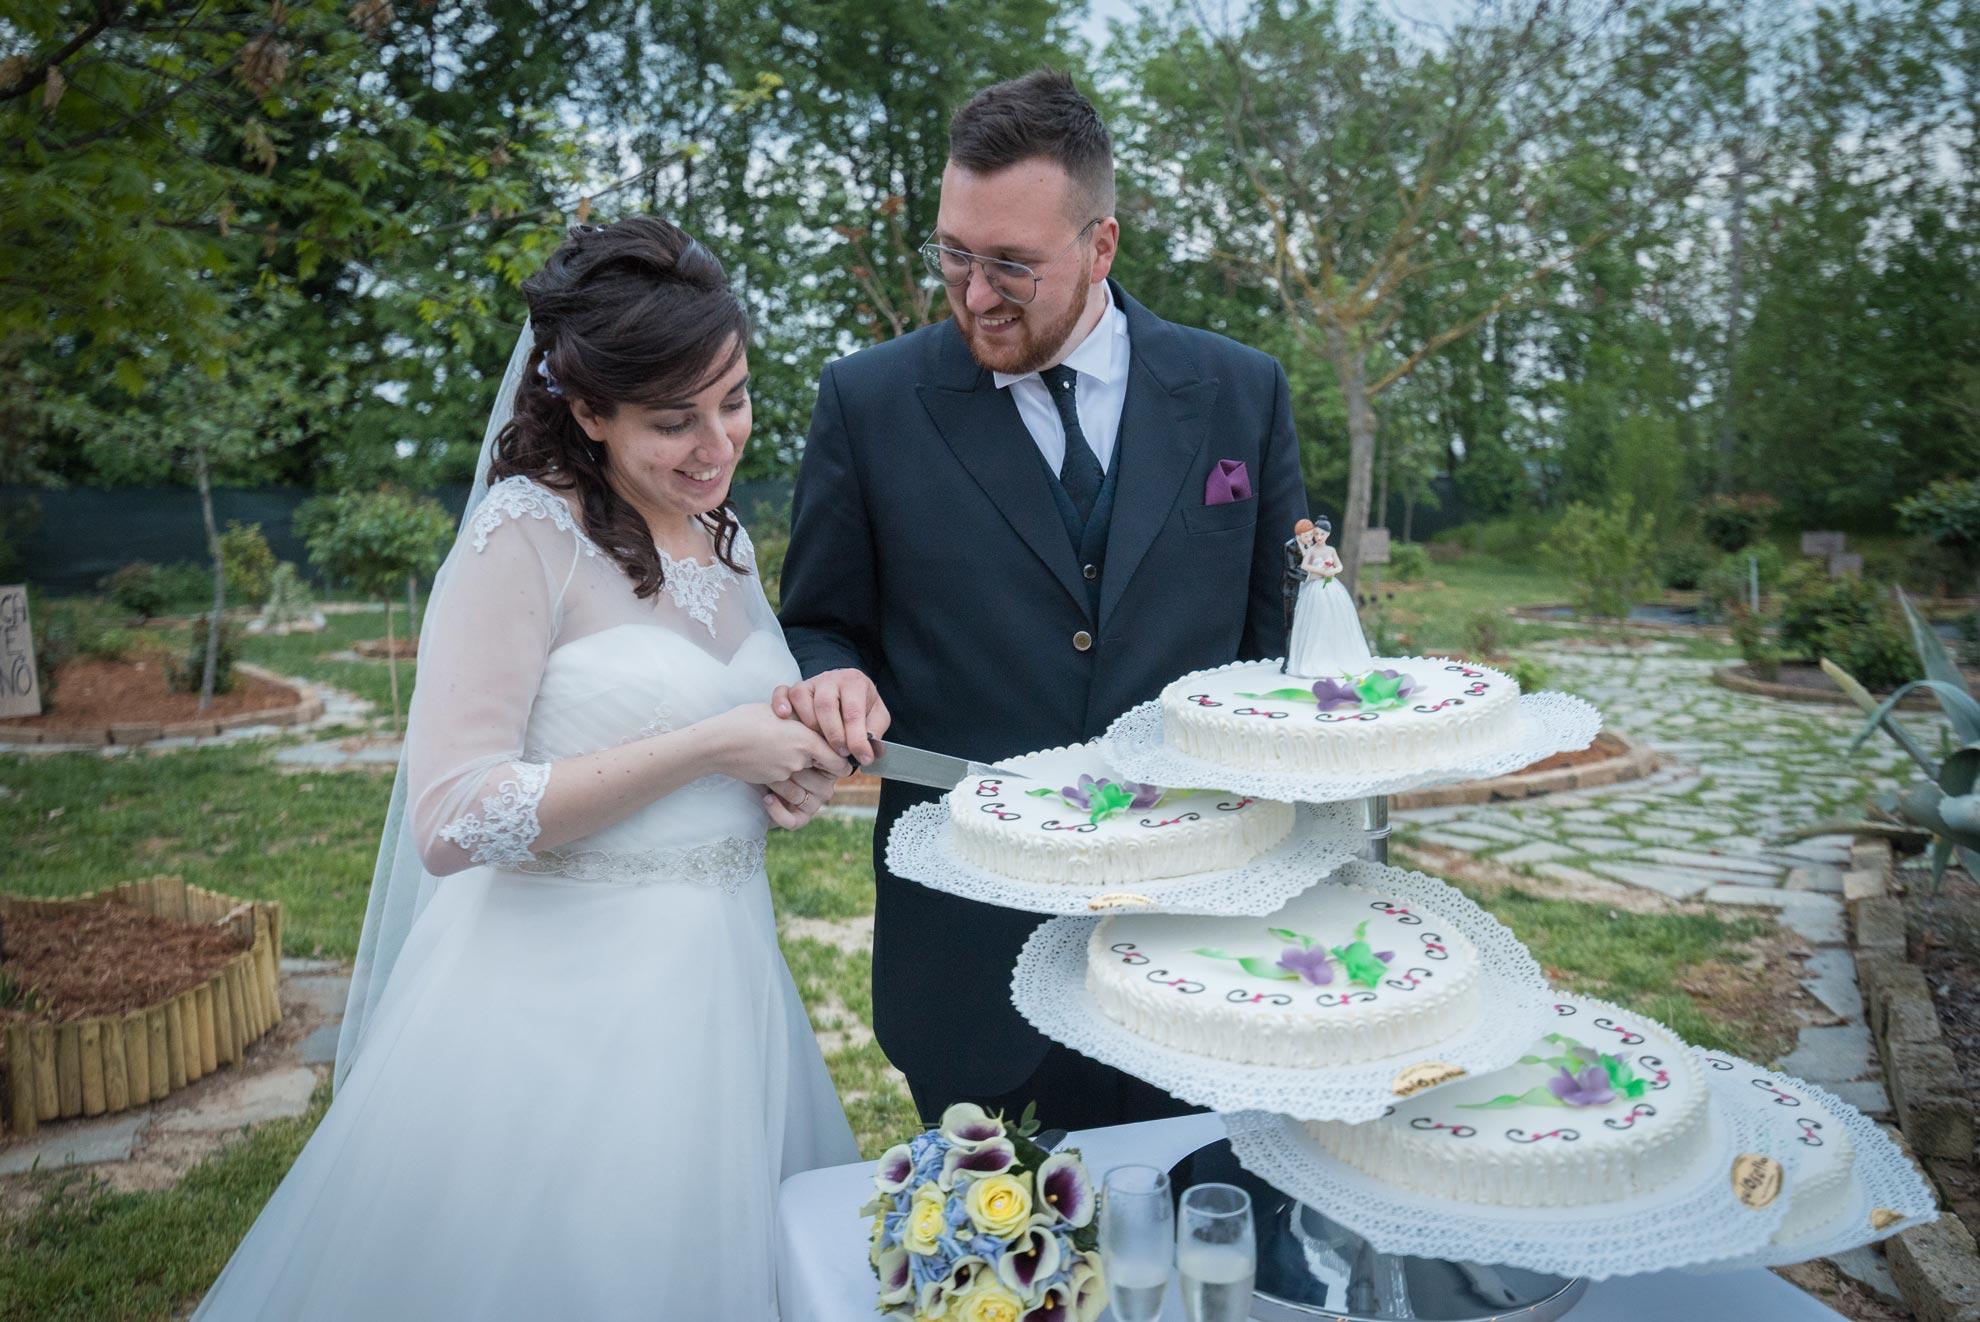 Matrimonio a Narzole Lorenza Diego - DSC 0772 - Fotografie matrimonio ristorante - Fotografie matrimonio ristorante